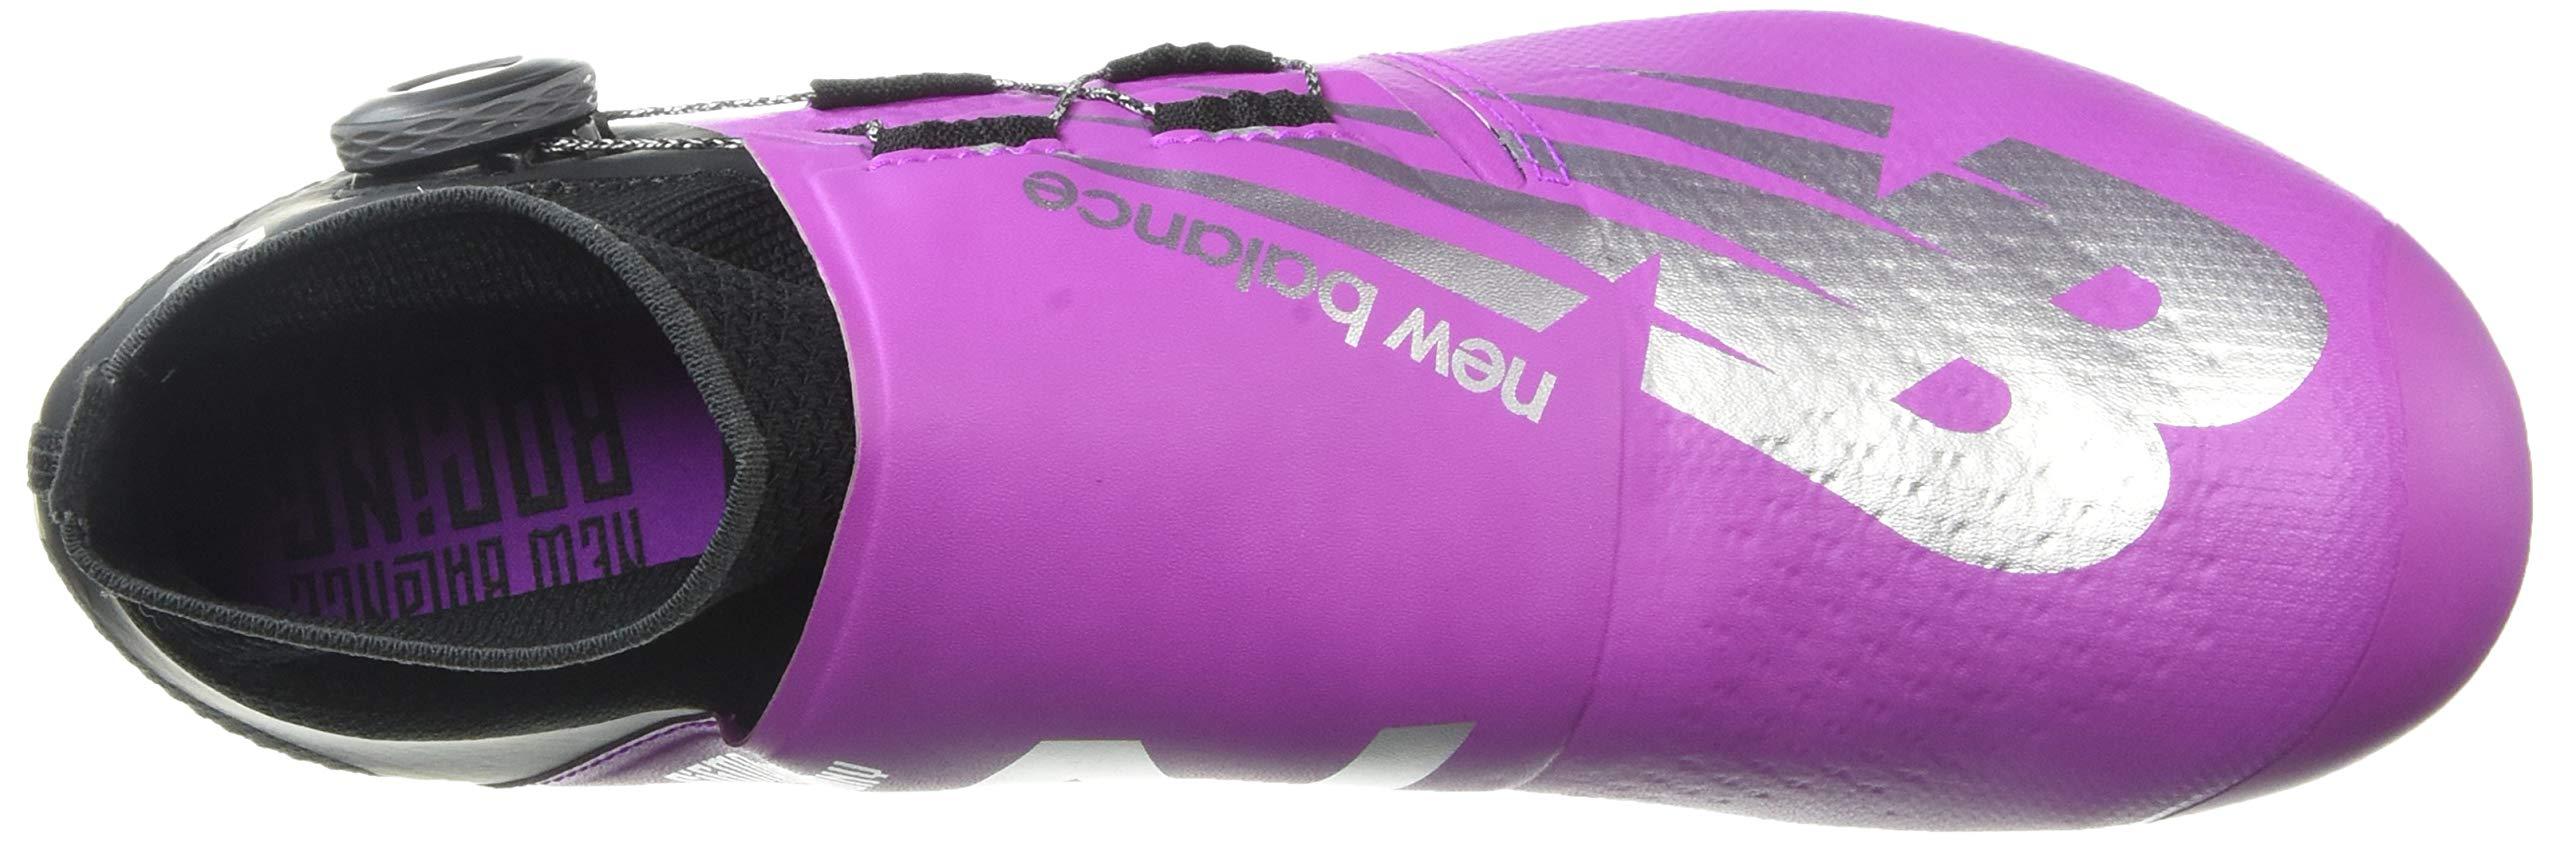 New Balance Men's Sigma Harmony Vazee Track Shoe Voltage Violet/Black 4.5 D US by New Balance (Image #8)